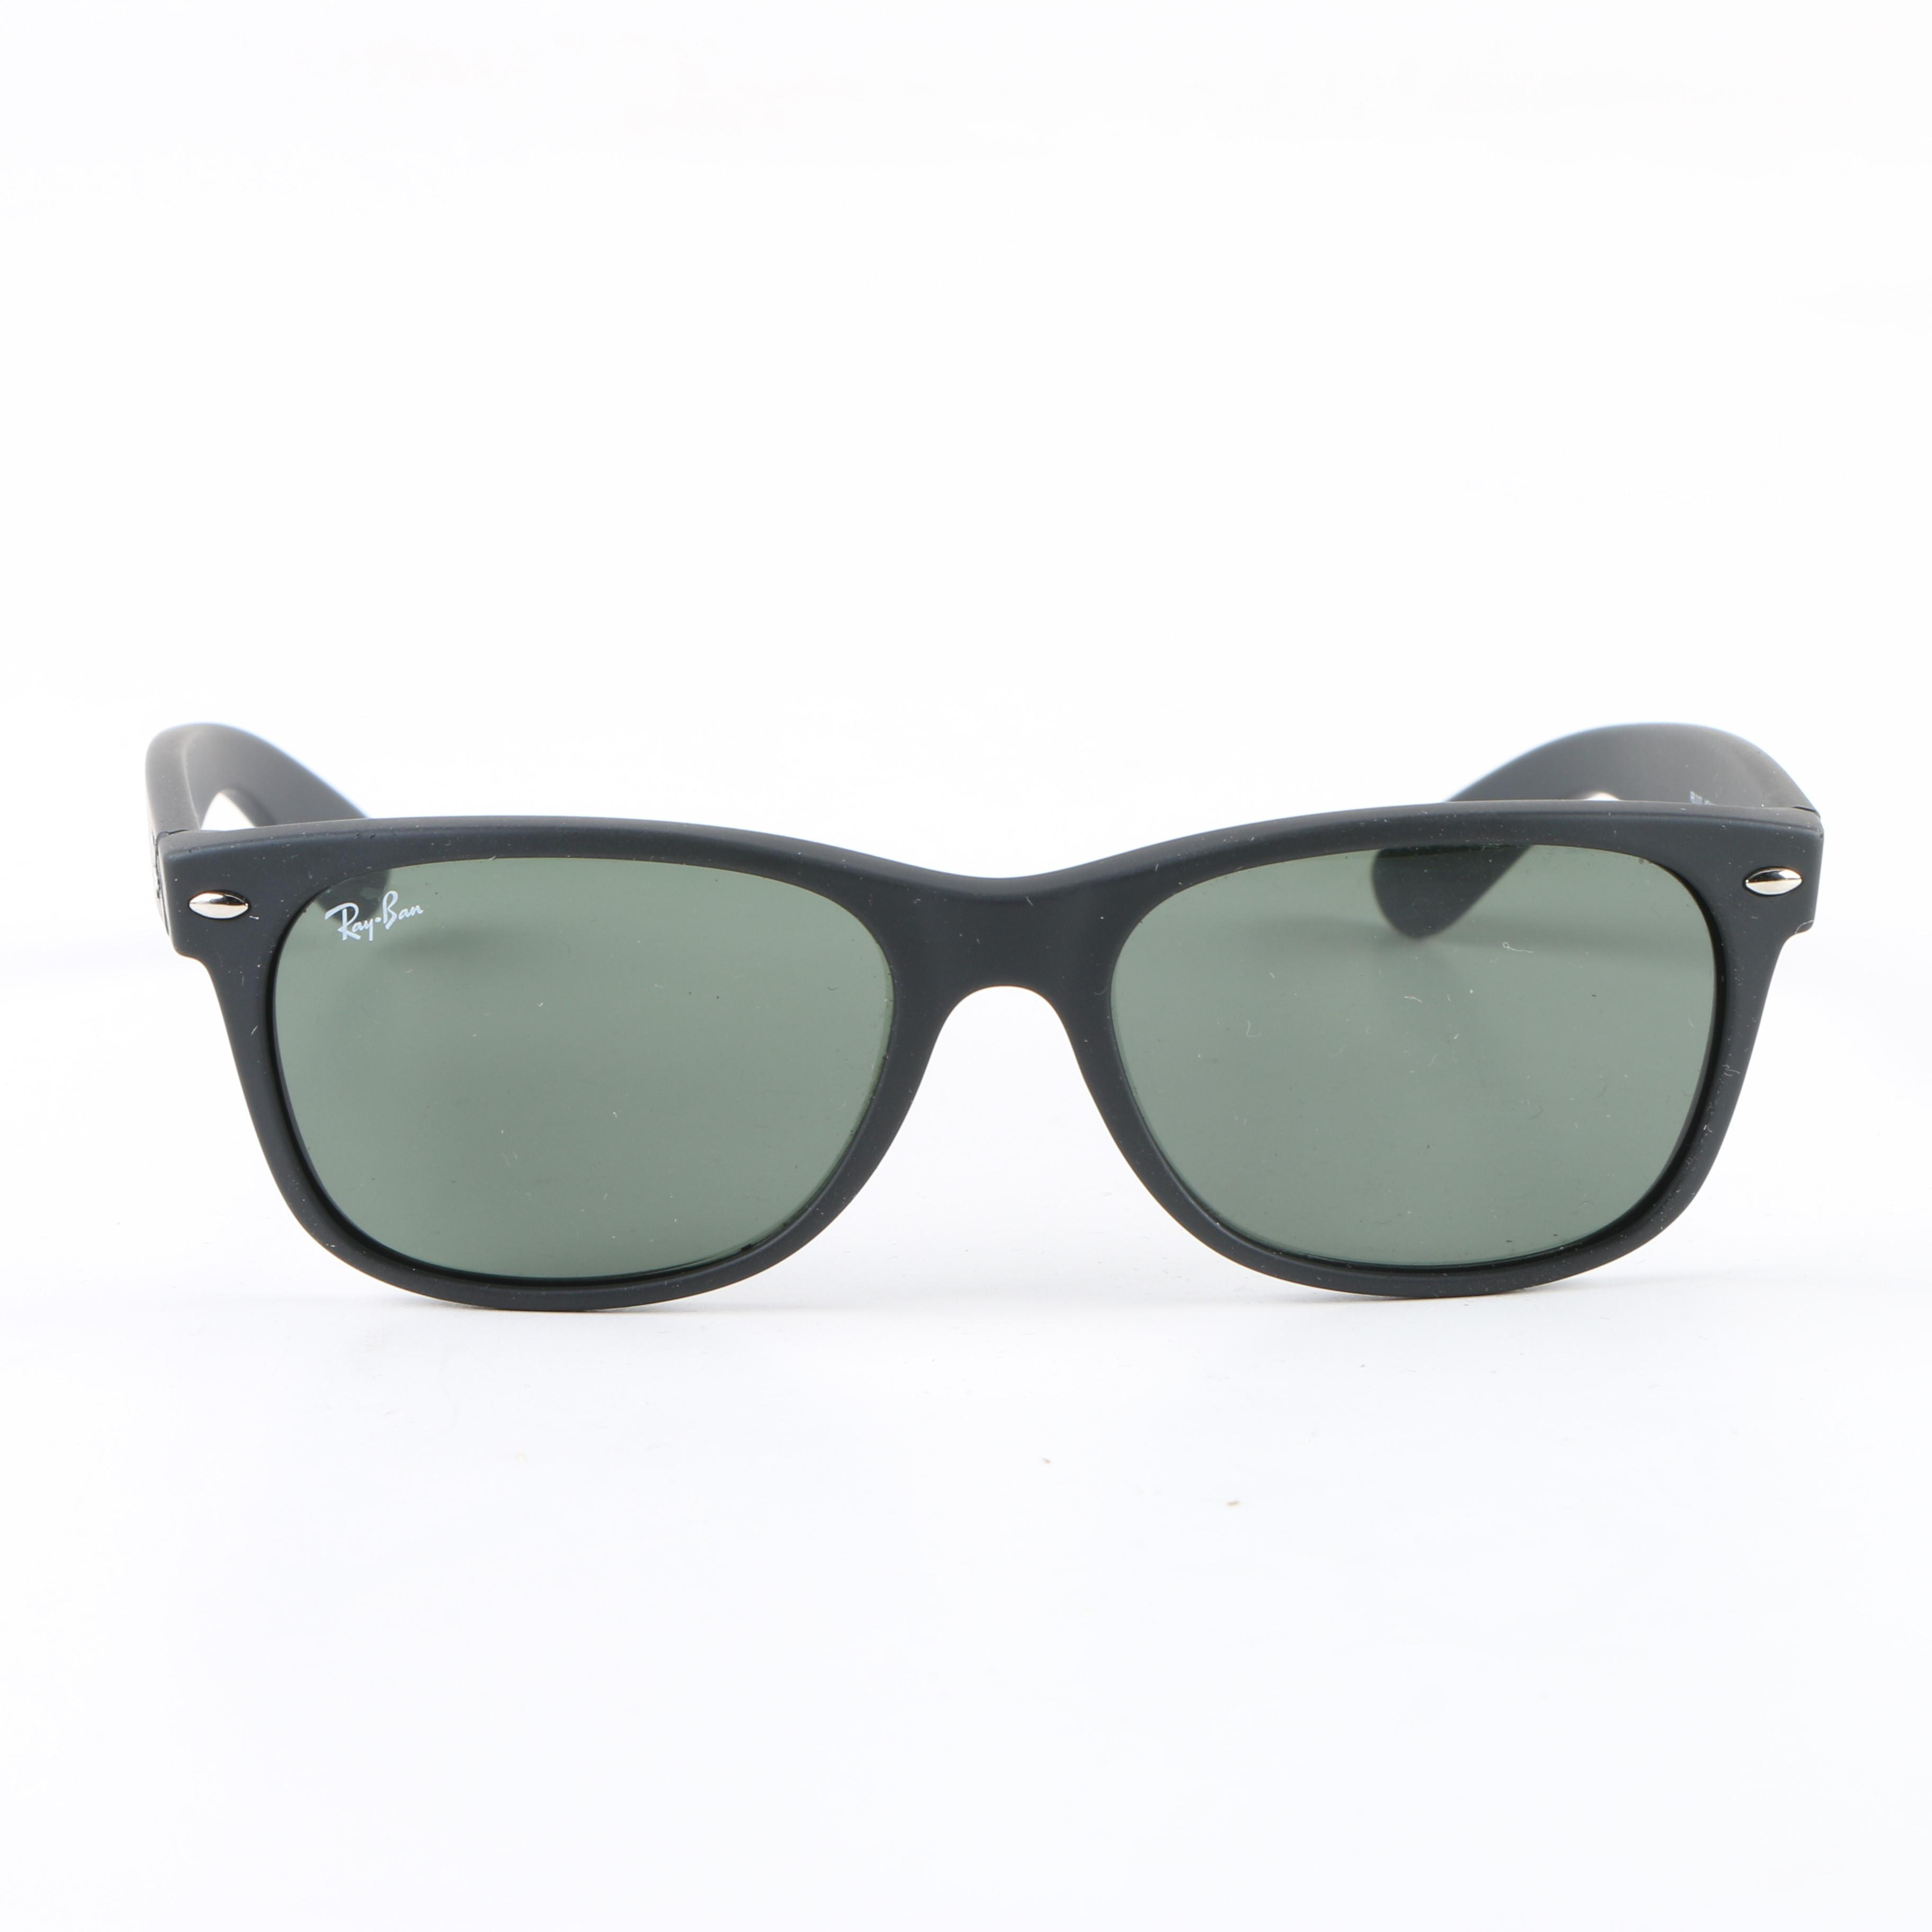 Ray-Ban New Wayfarer Matte Black Sunglasses, Made in Italy